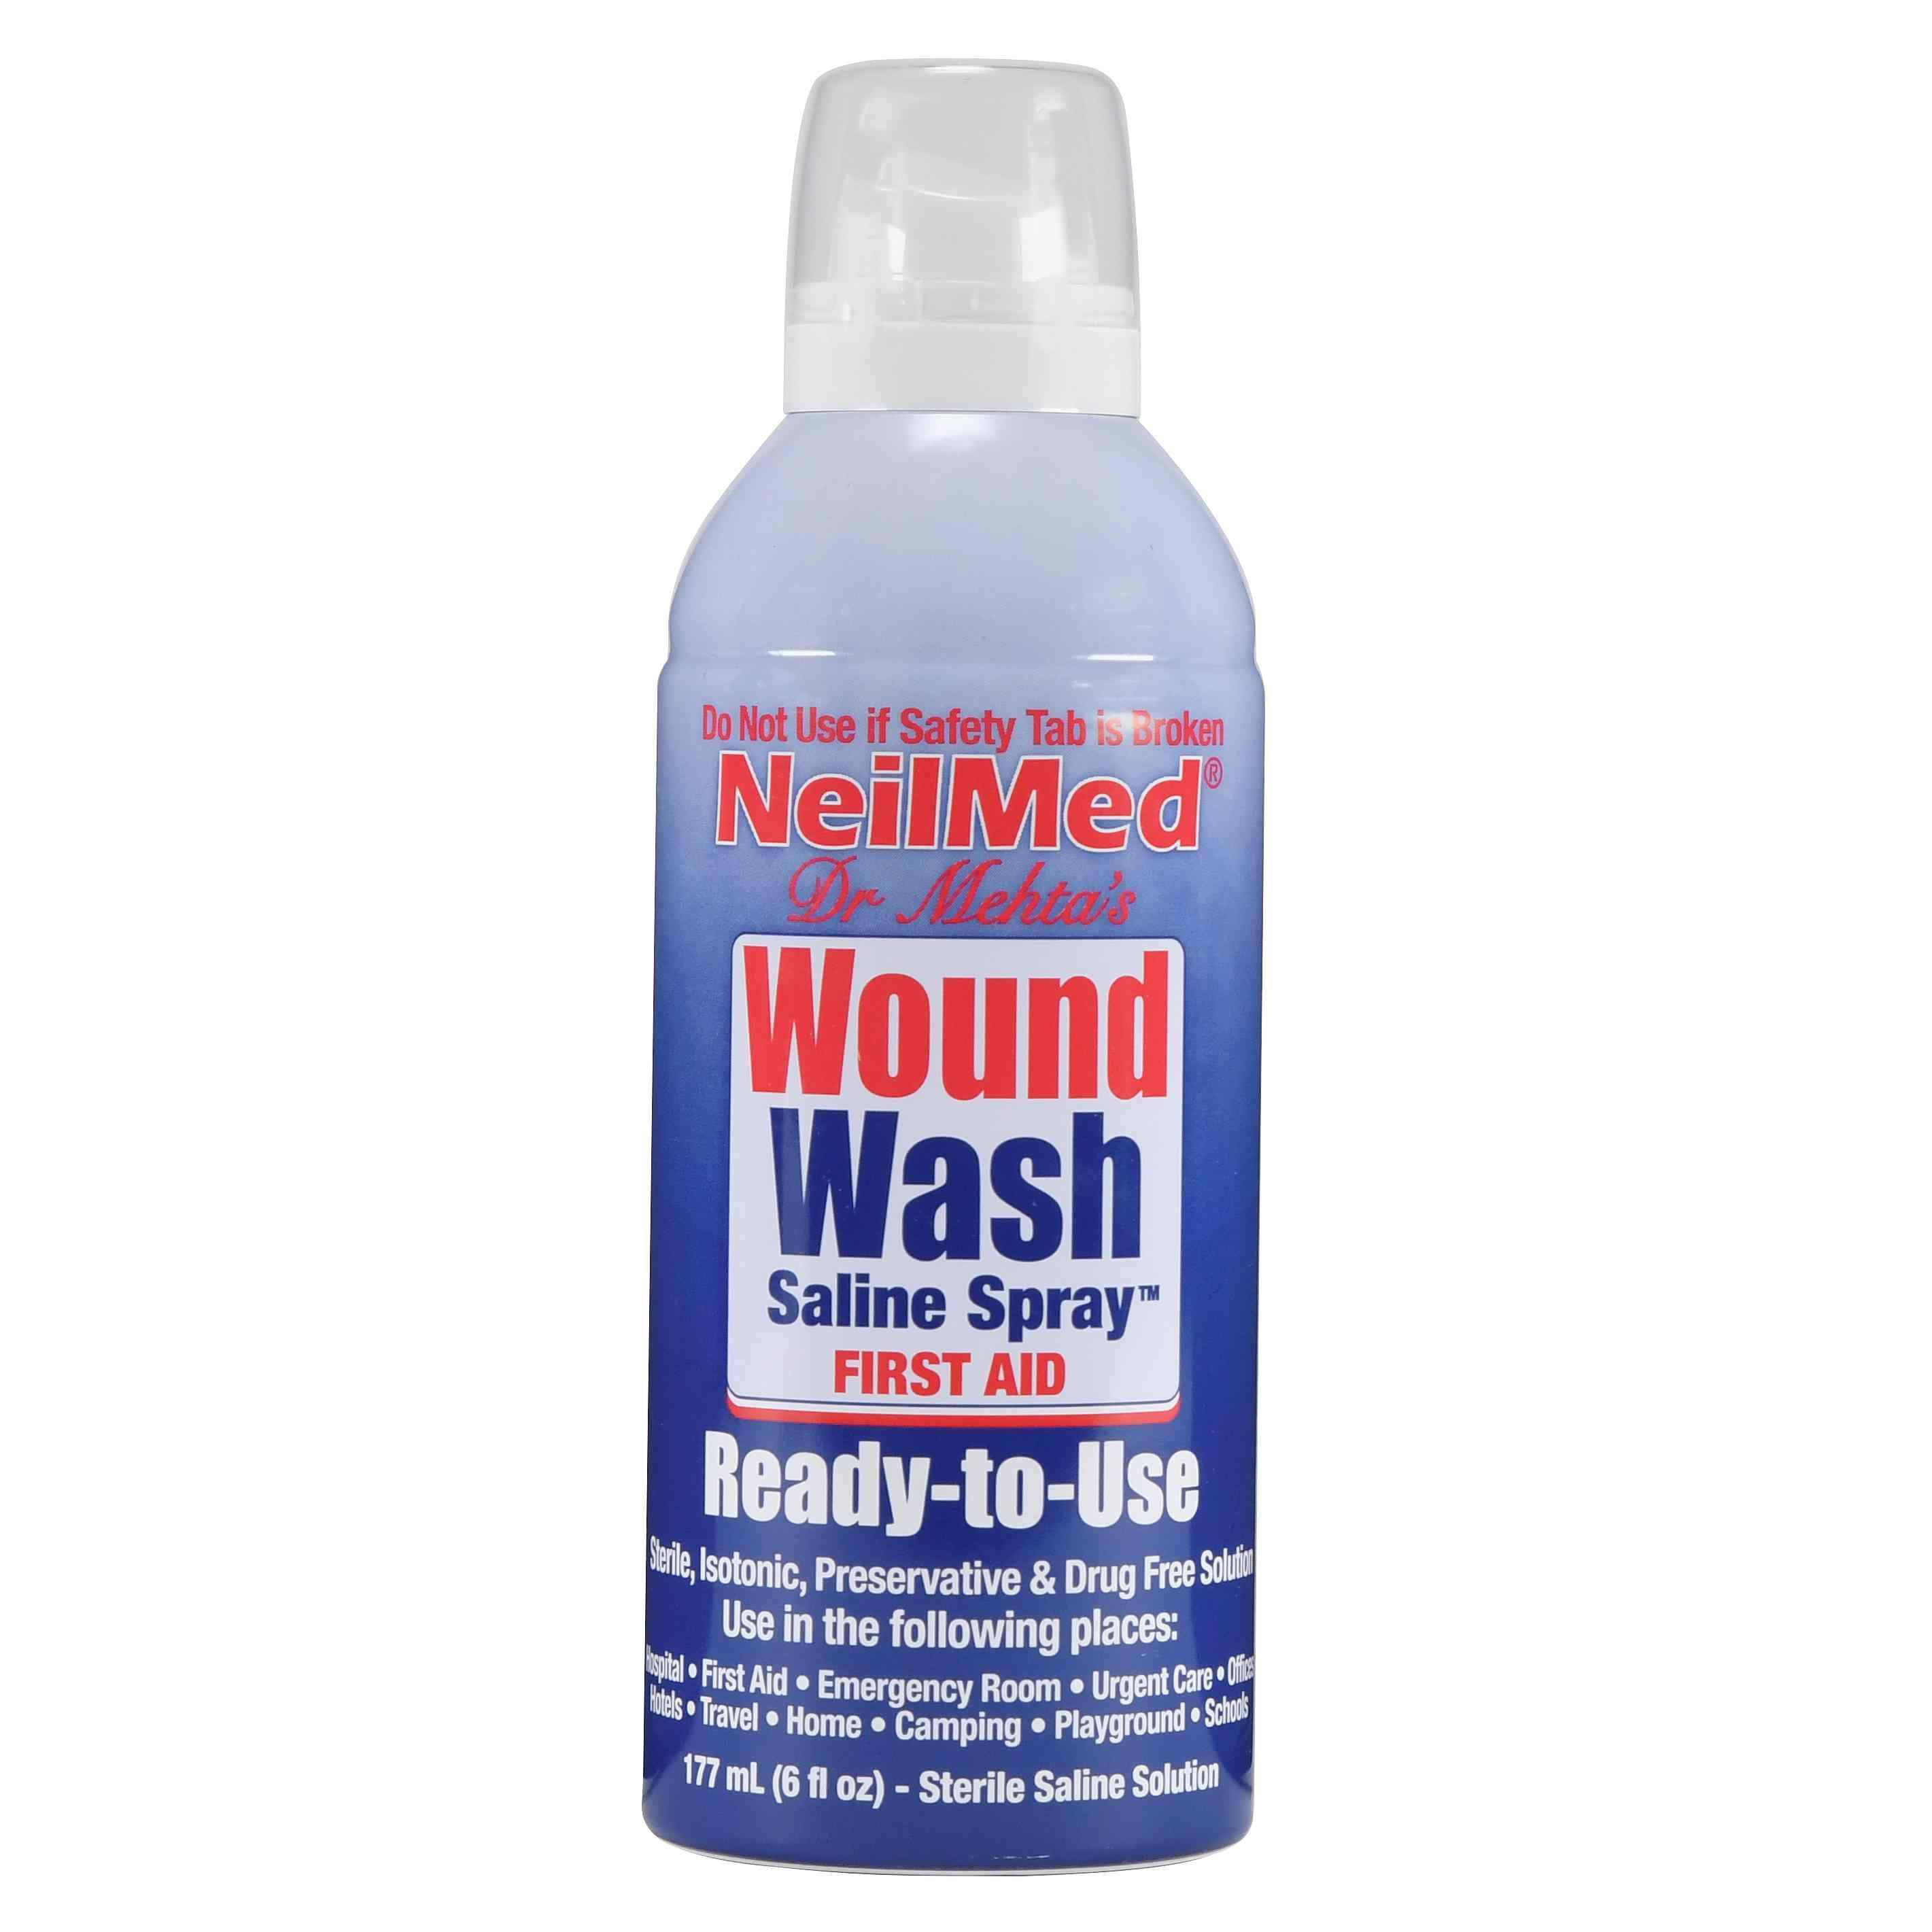 NeilMed Sterile Saline Solution Wound Wash